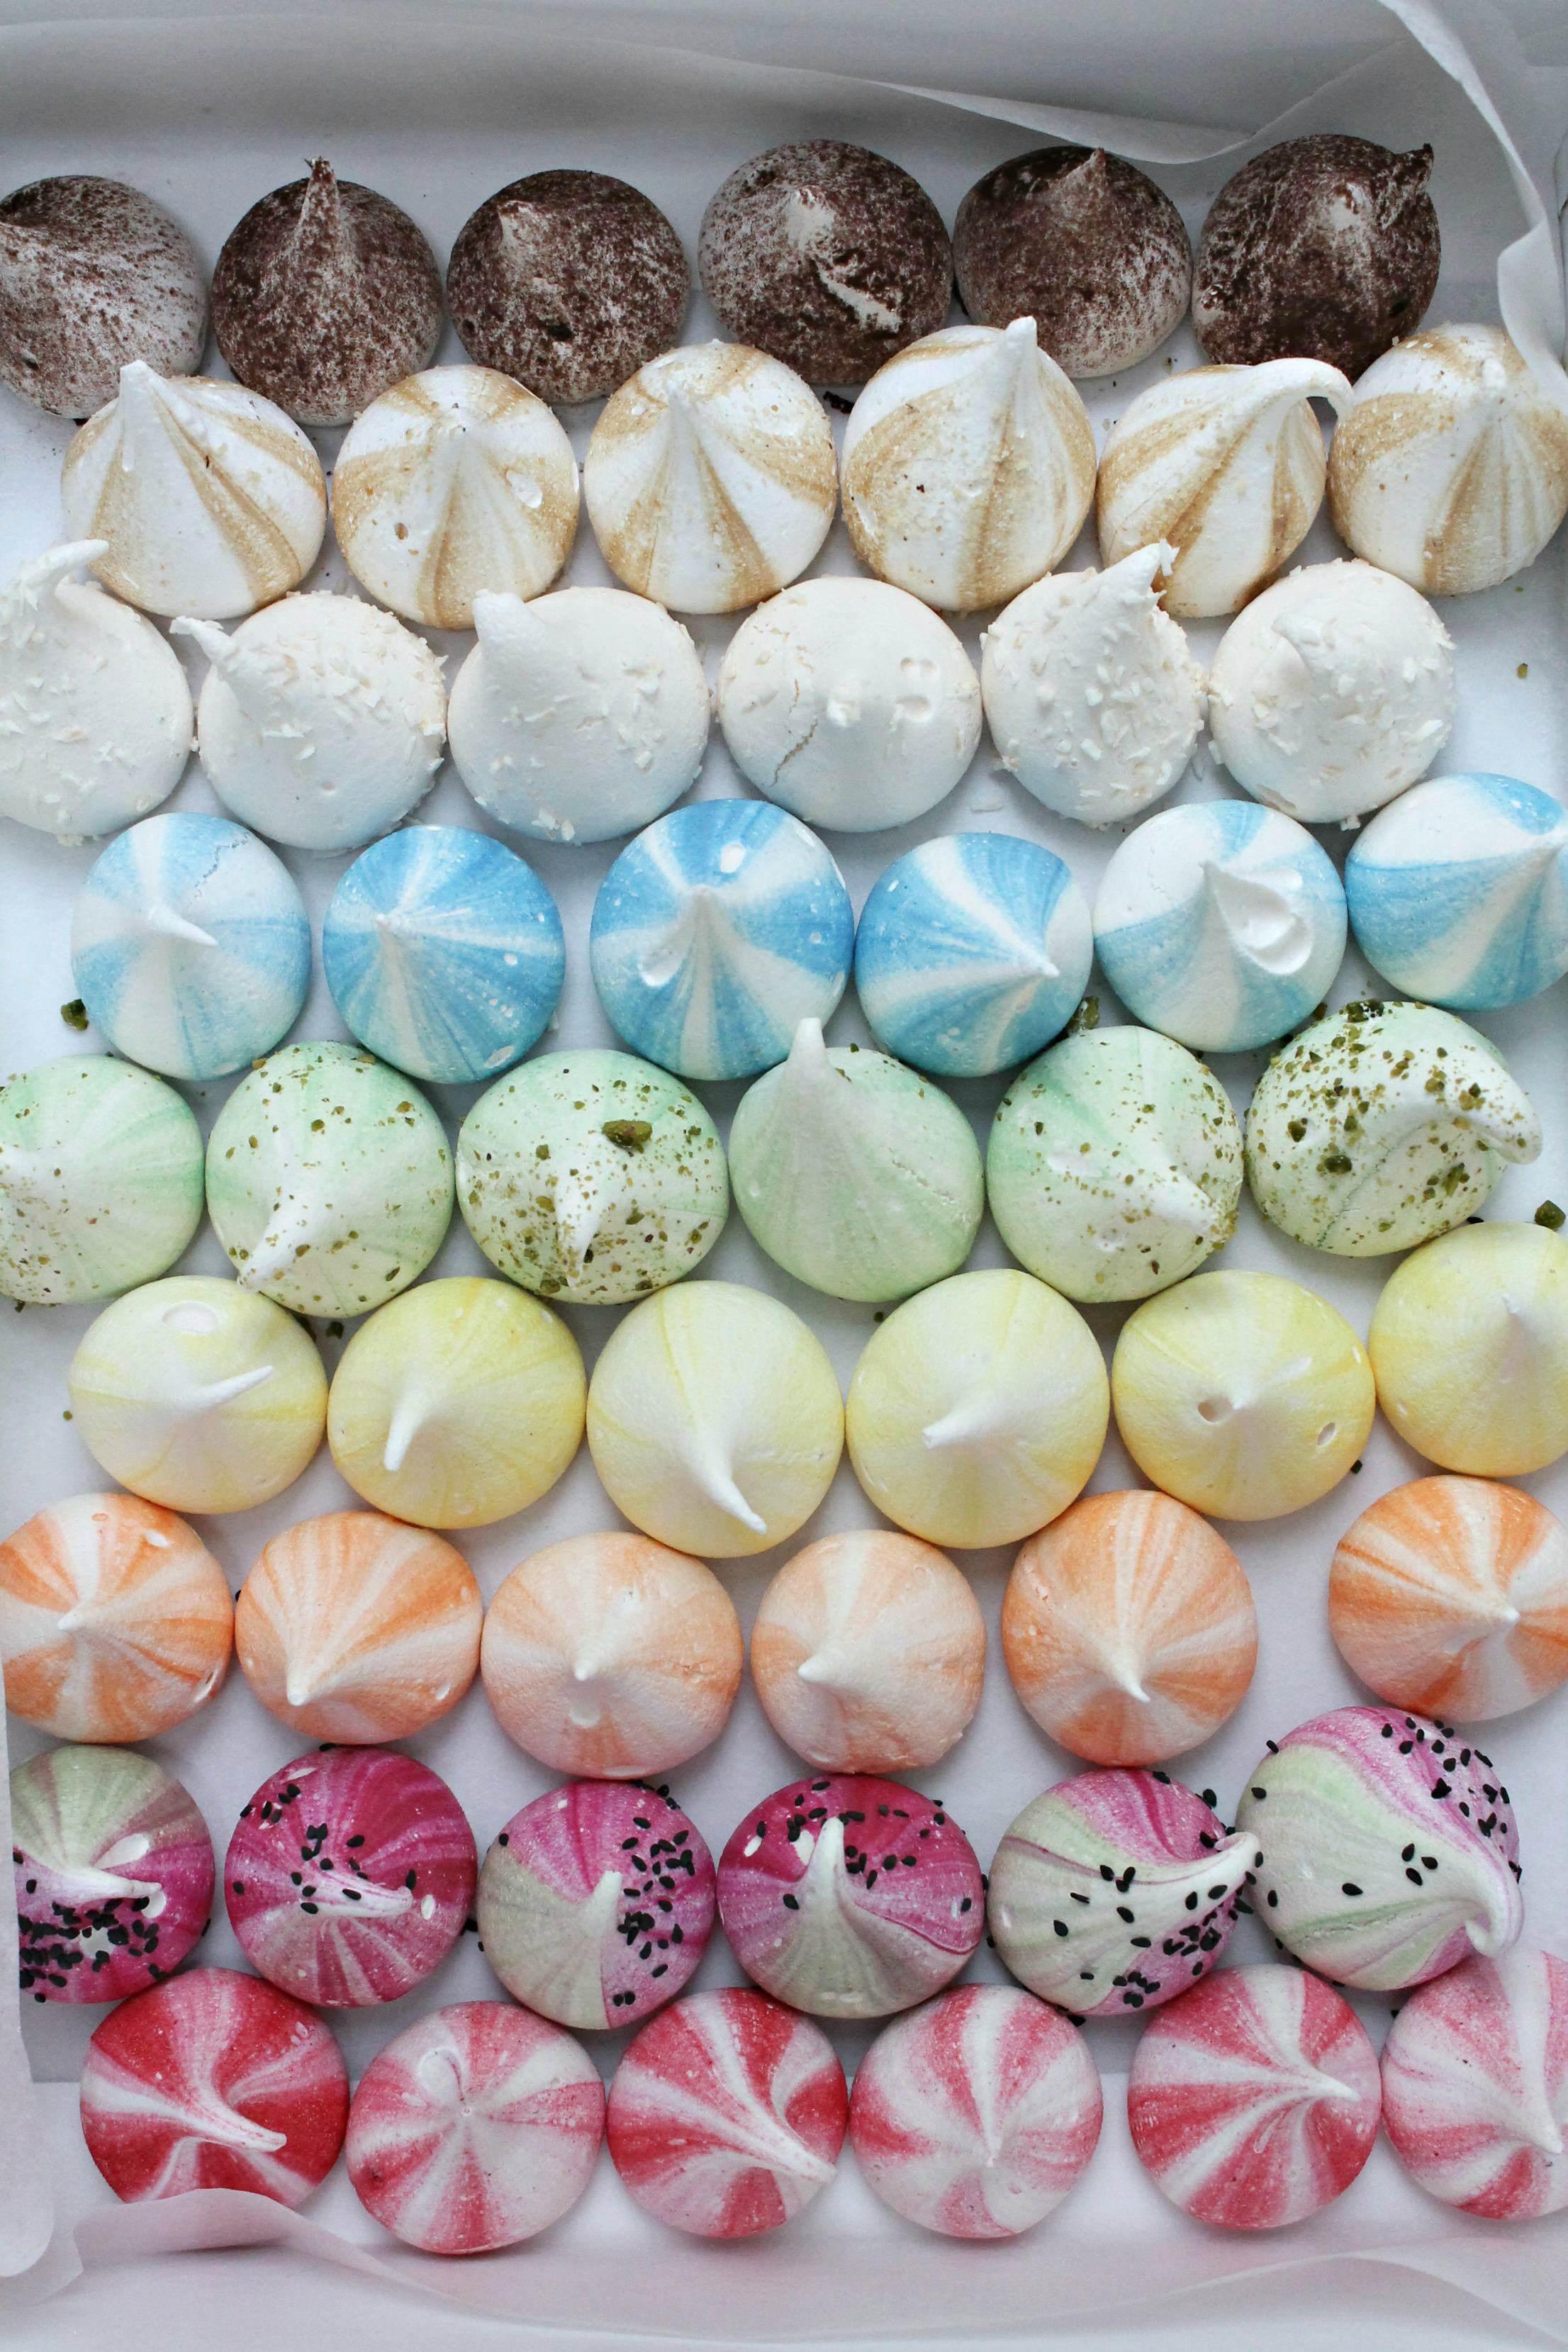 meringue-girls-colourful-meringues-little-big-bell